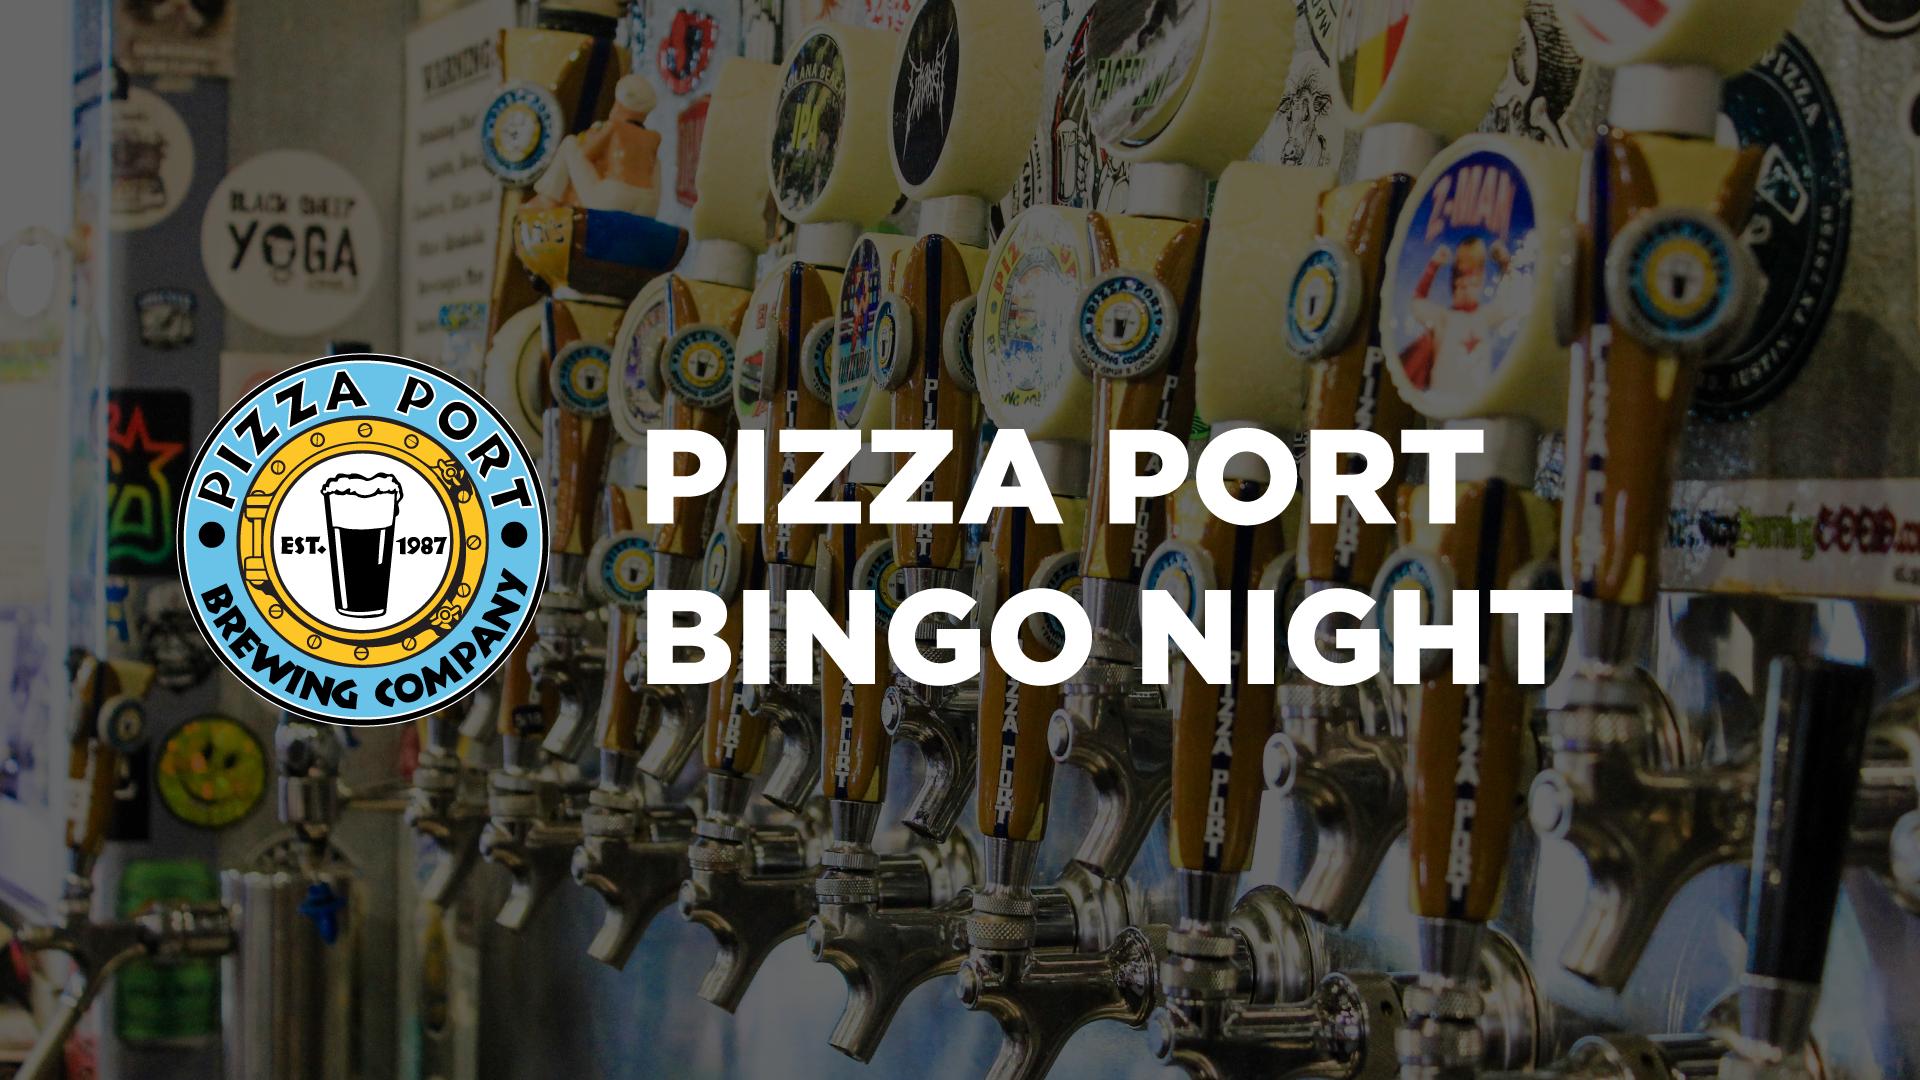 Pizza Port Bingo Night